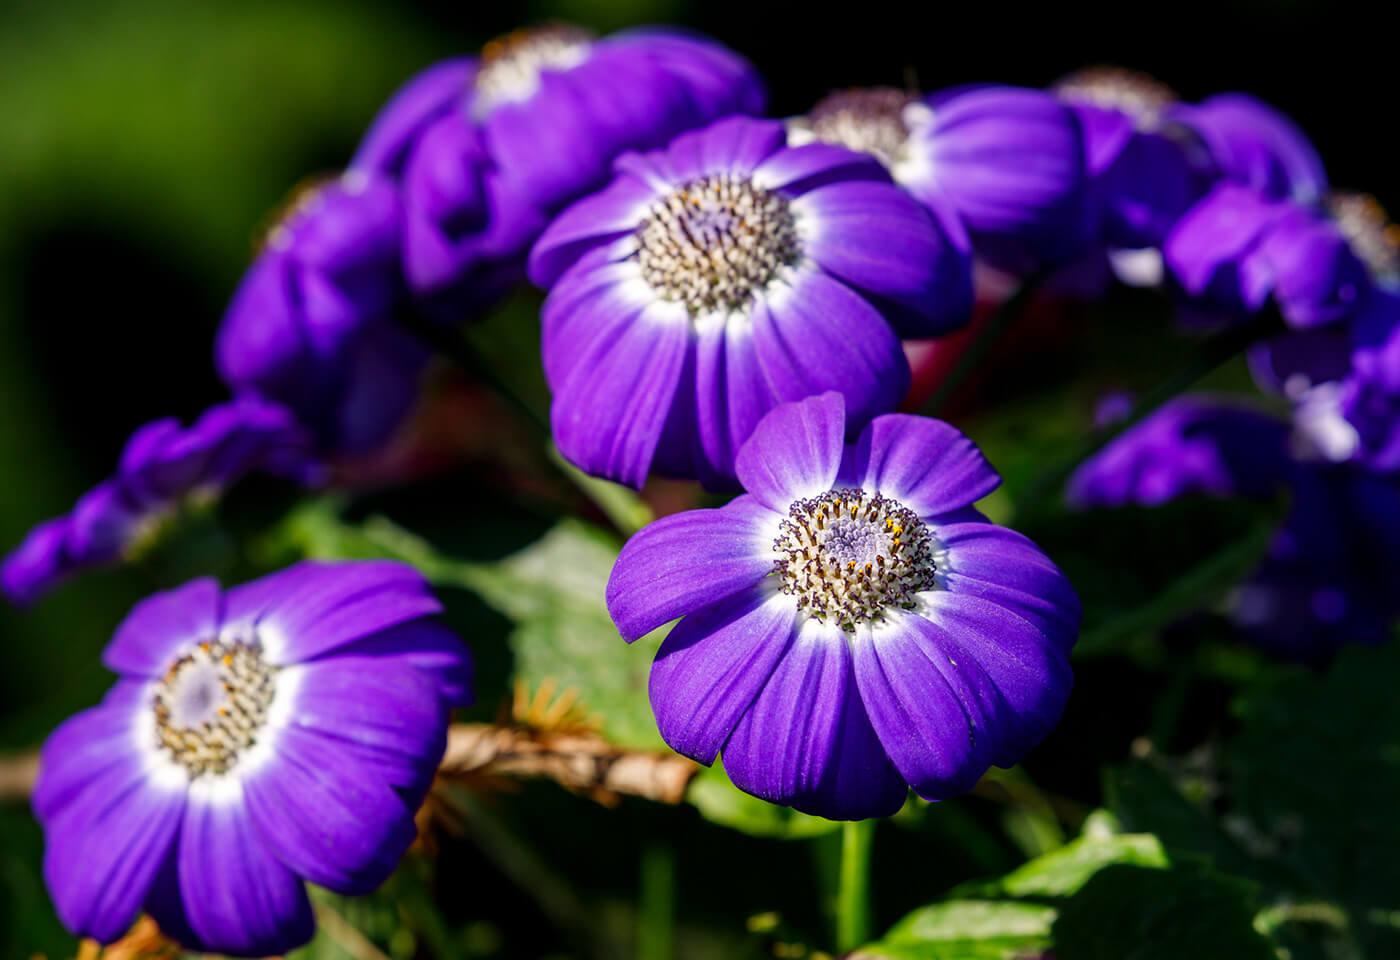 Close-up photo of purple flower in garden